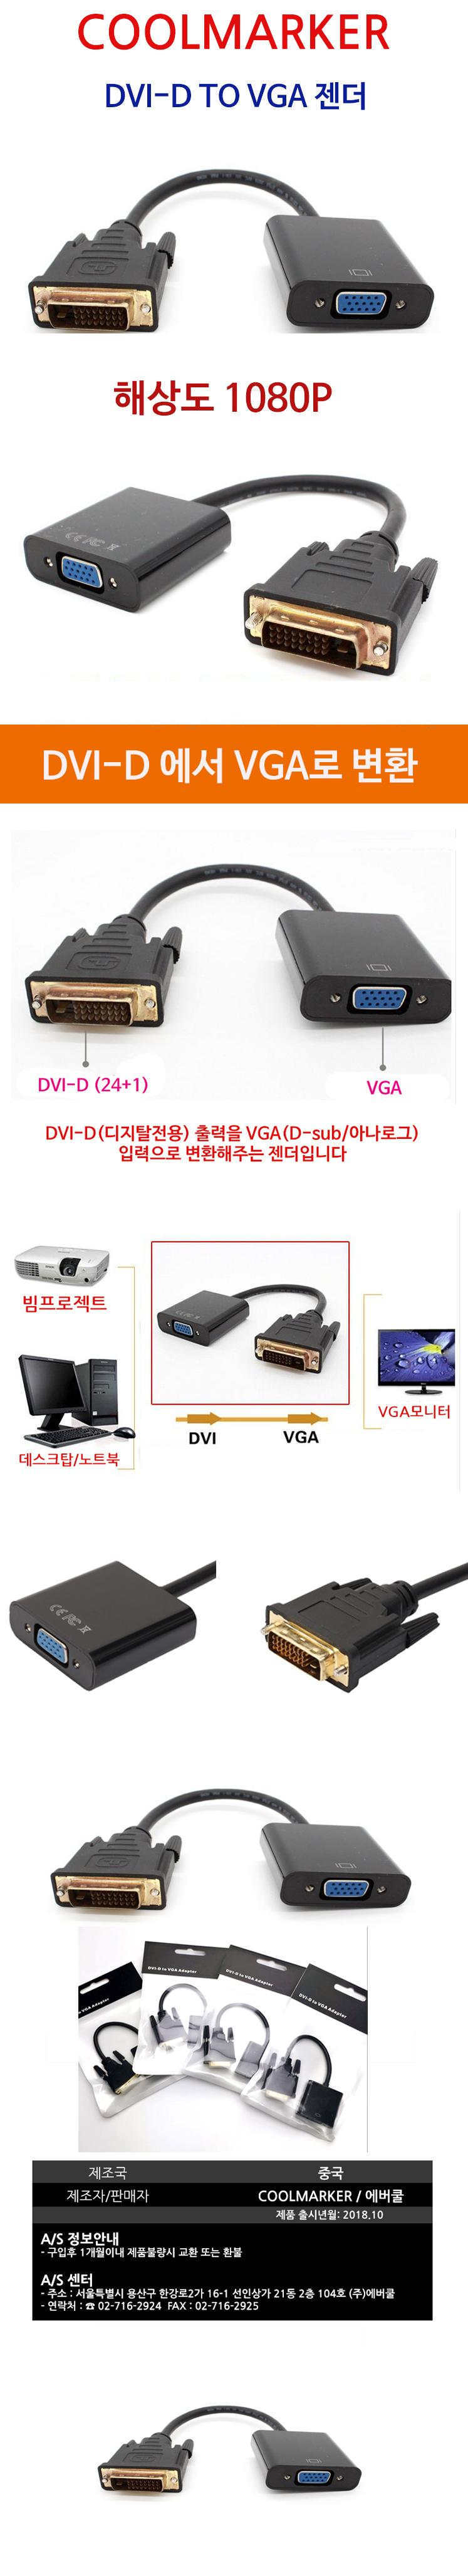 EVERCOOL COOLMARKER DVI-D to VGA 변환 젠더